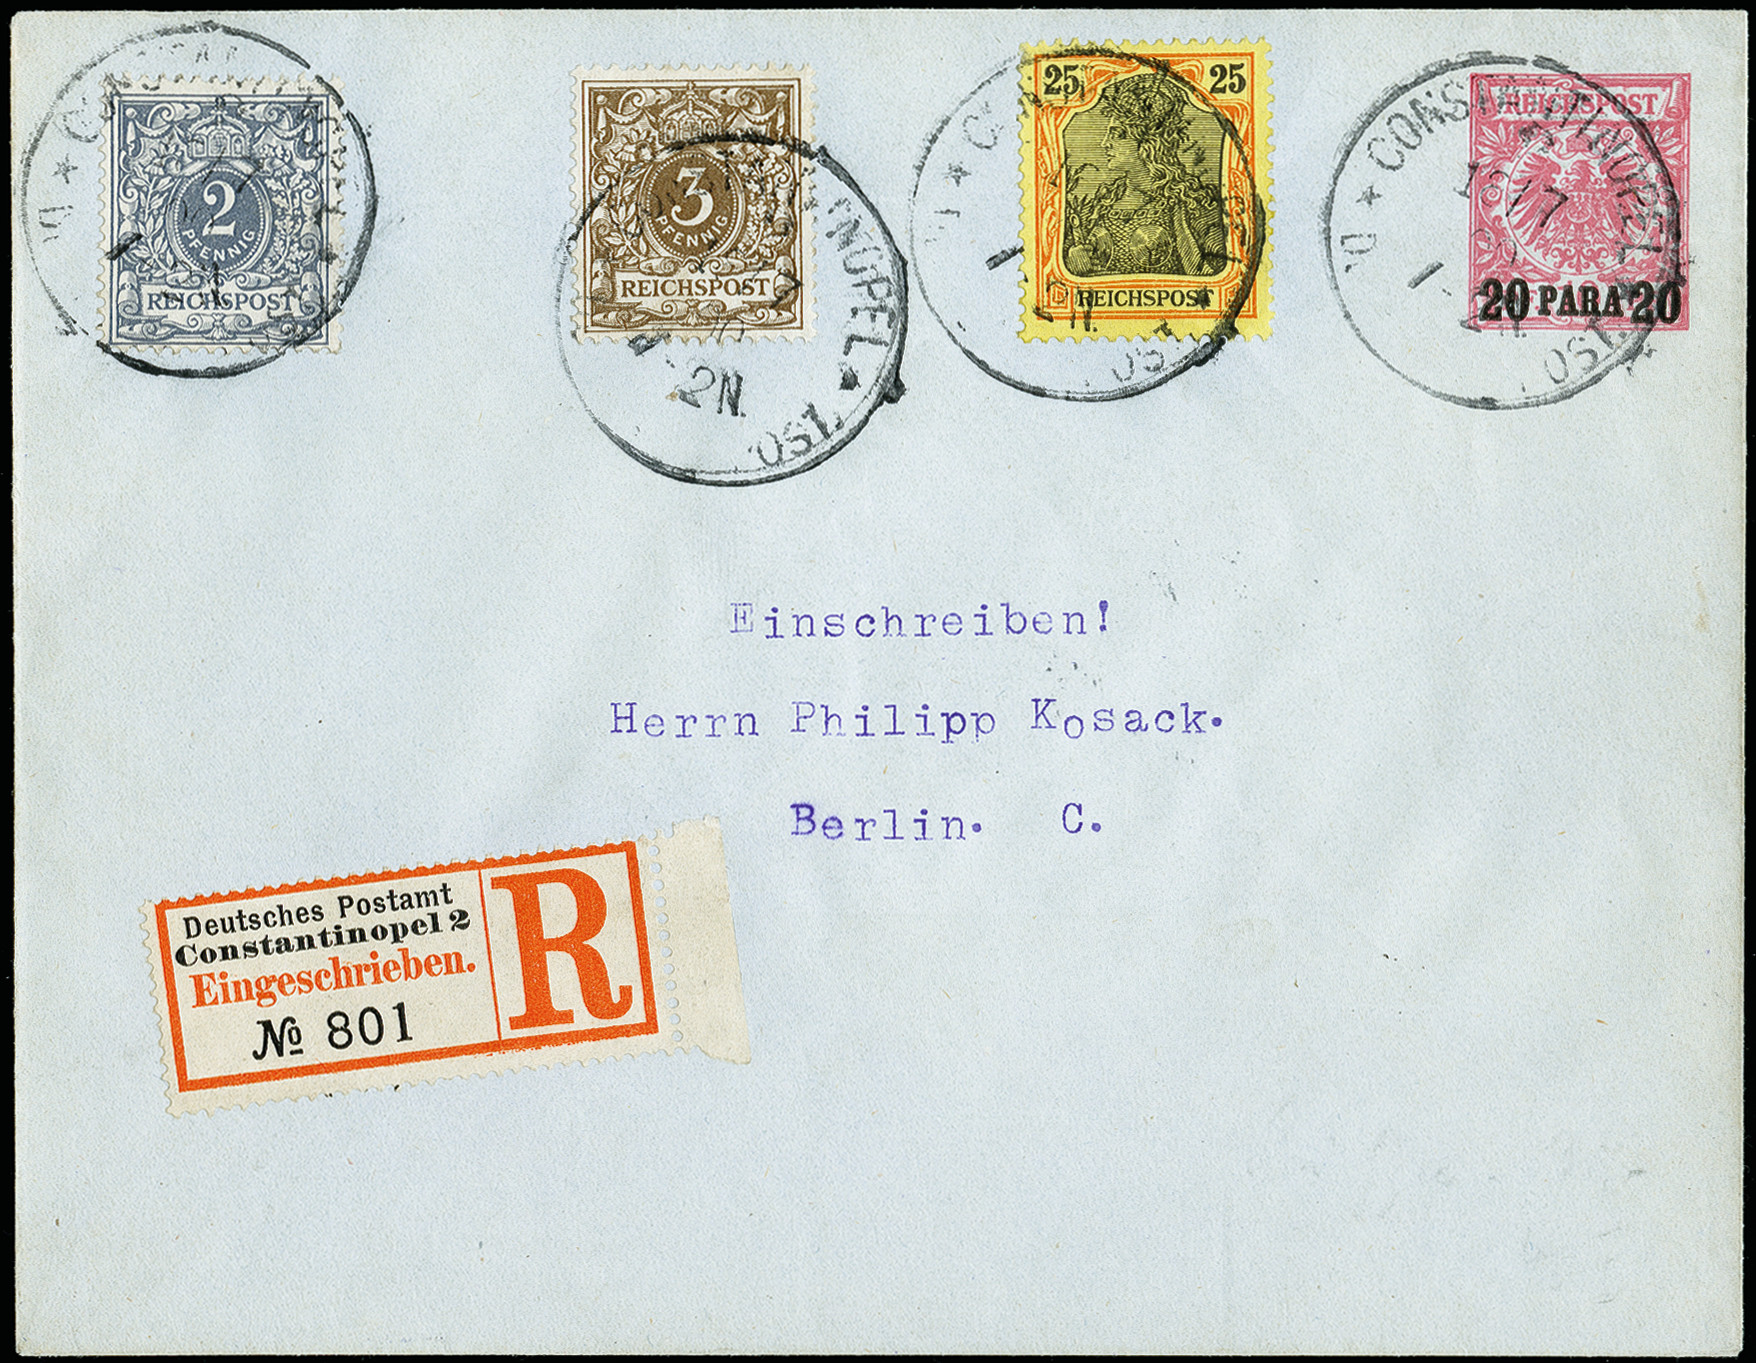 Lot 2801A - german colonies and offices abroad german post in turkey -  Heinrich Koehler Auktionen 373rd Heinrich Köhler auction - Day 5